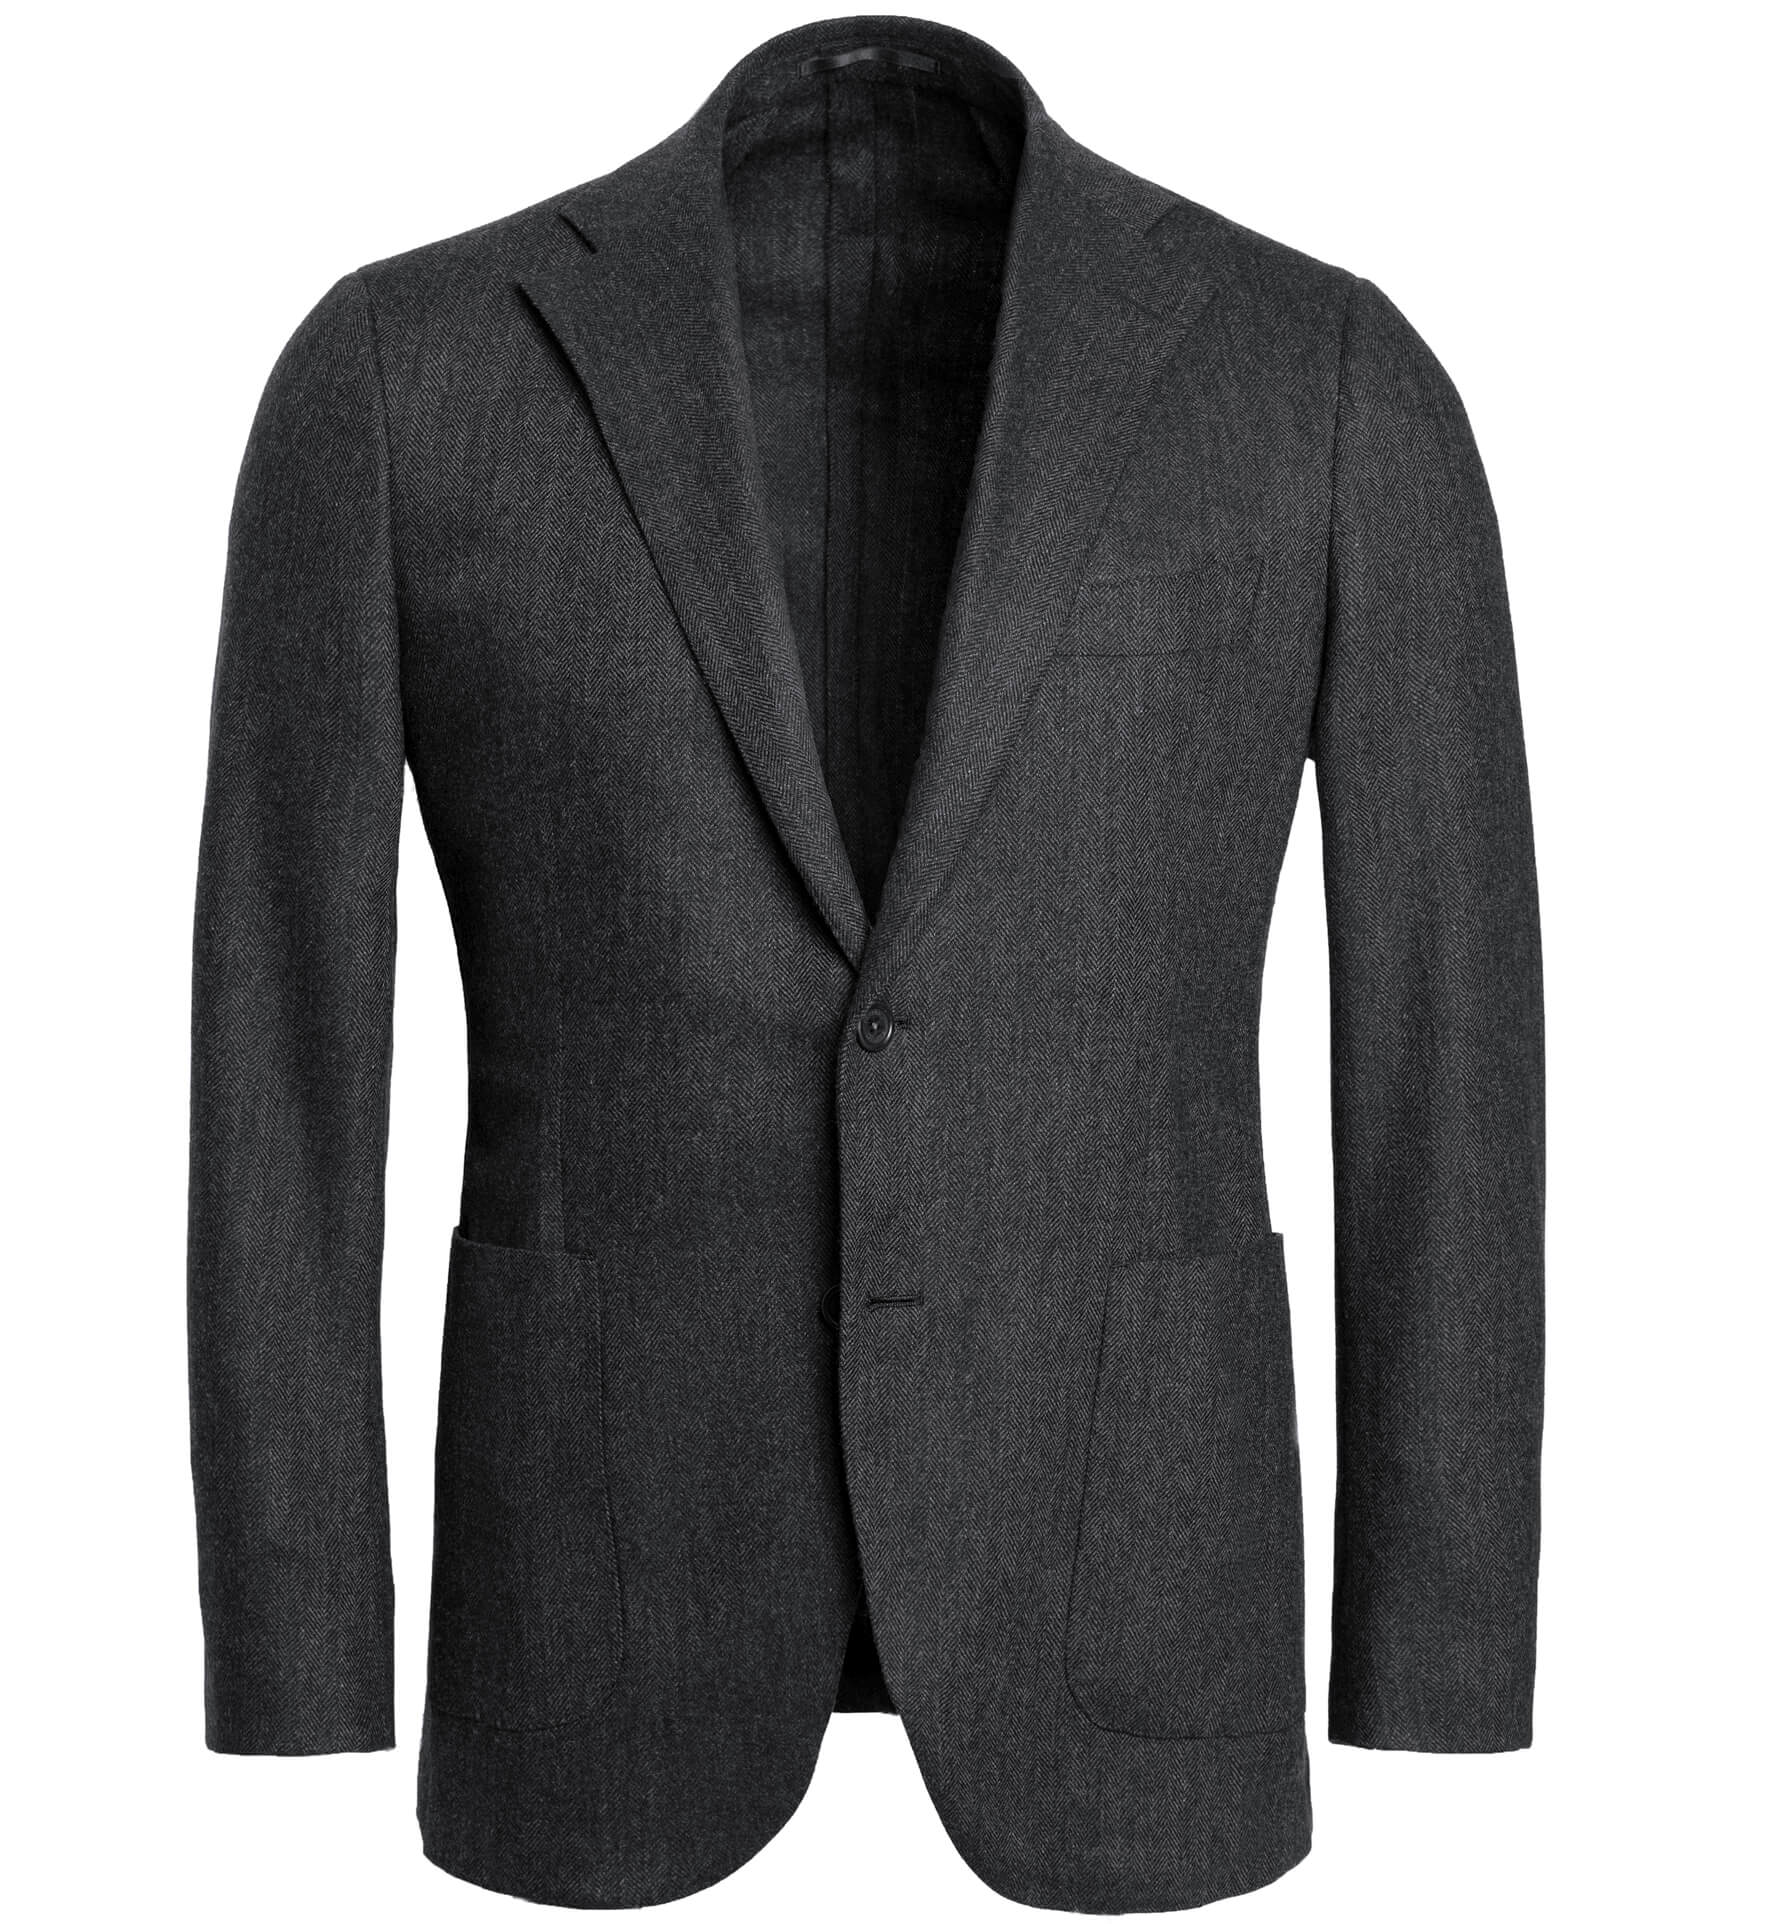 Zoom Image of Bedford Grey Herringbone Wool and Cashmere Jacket